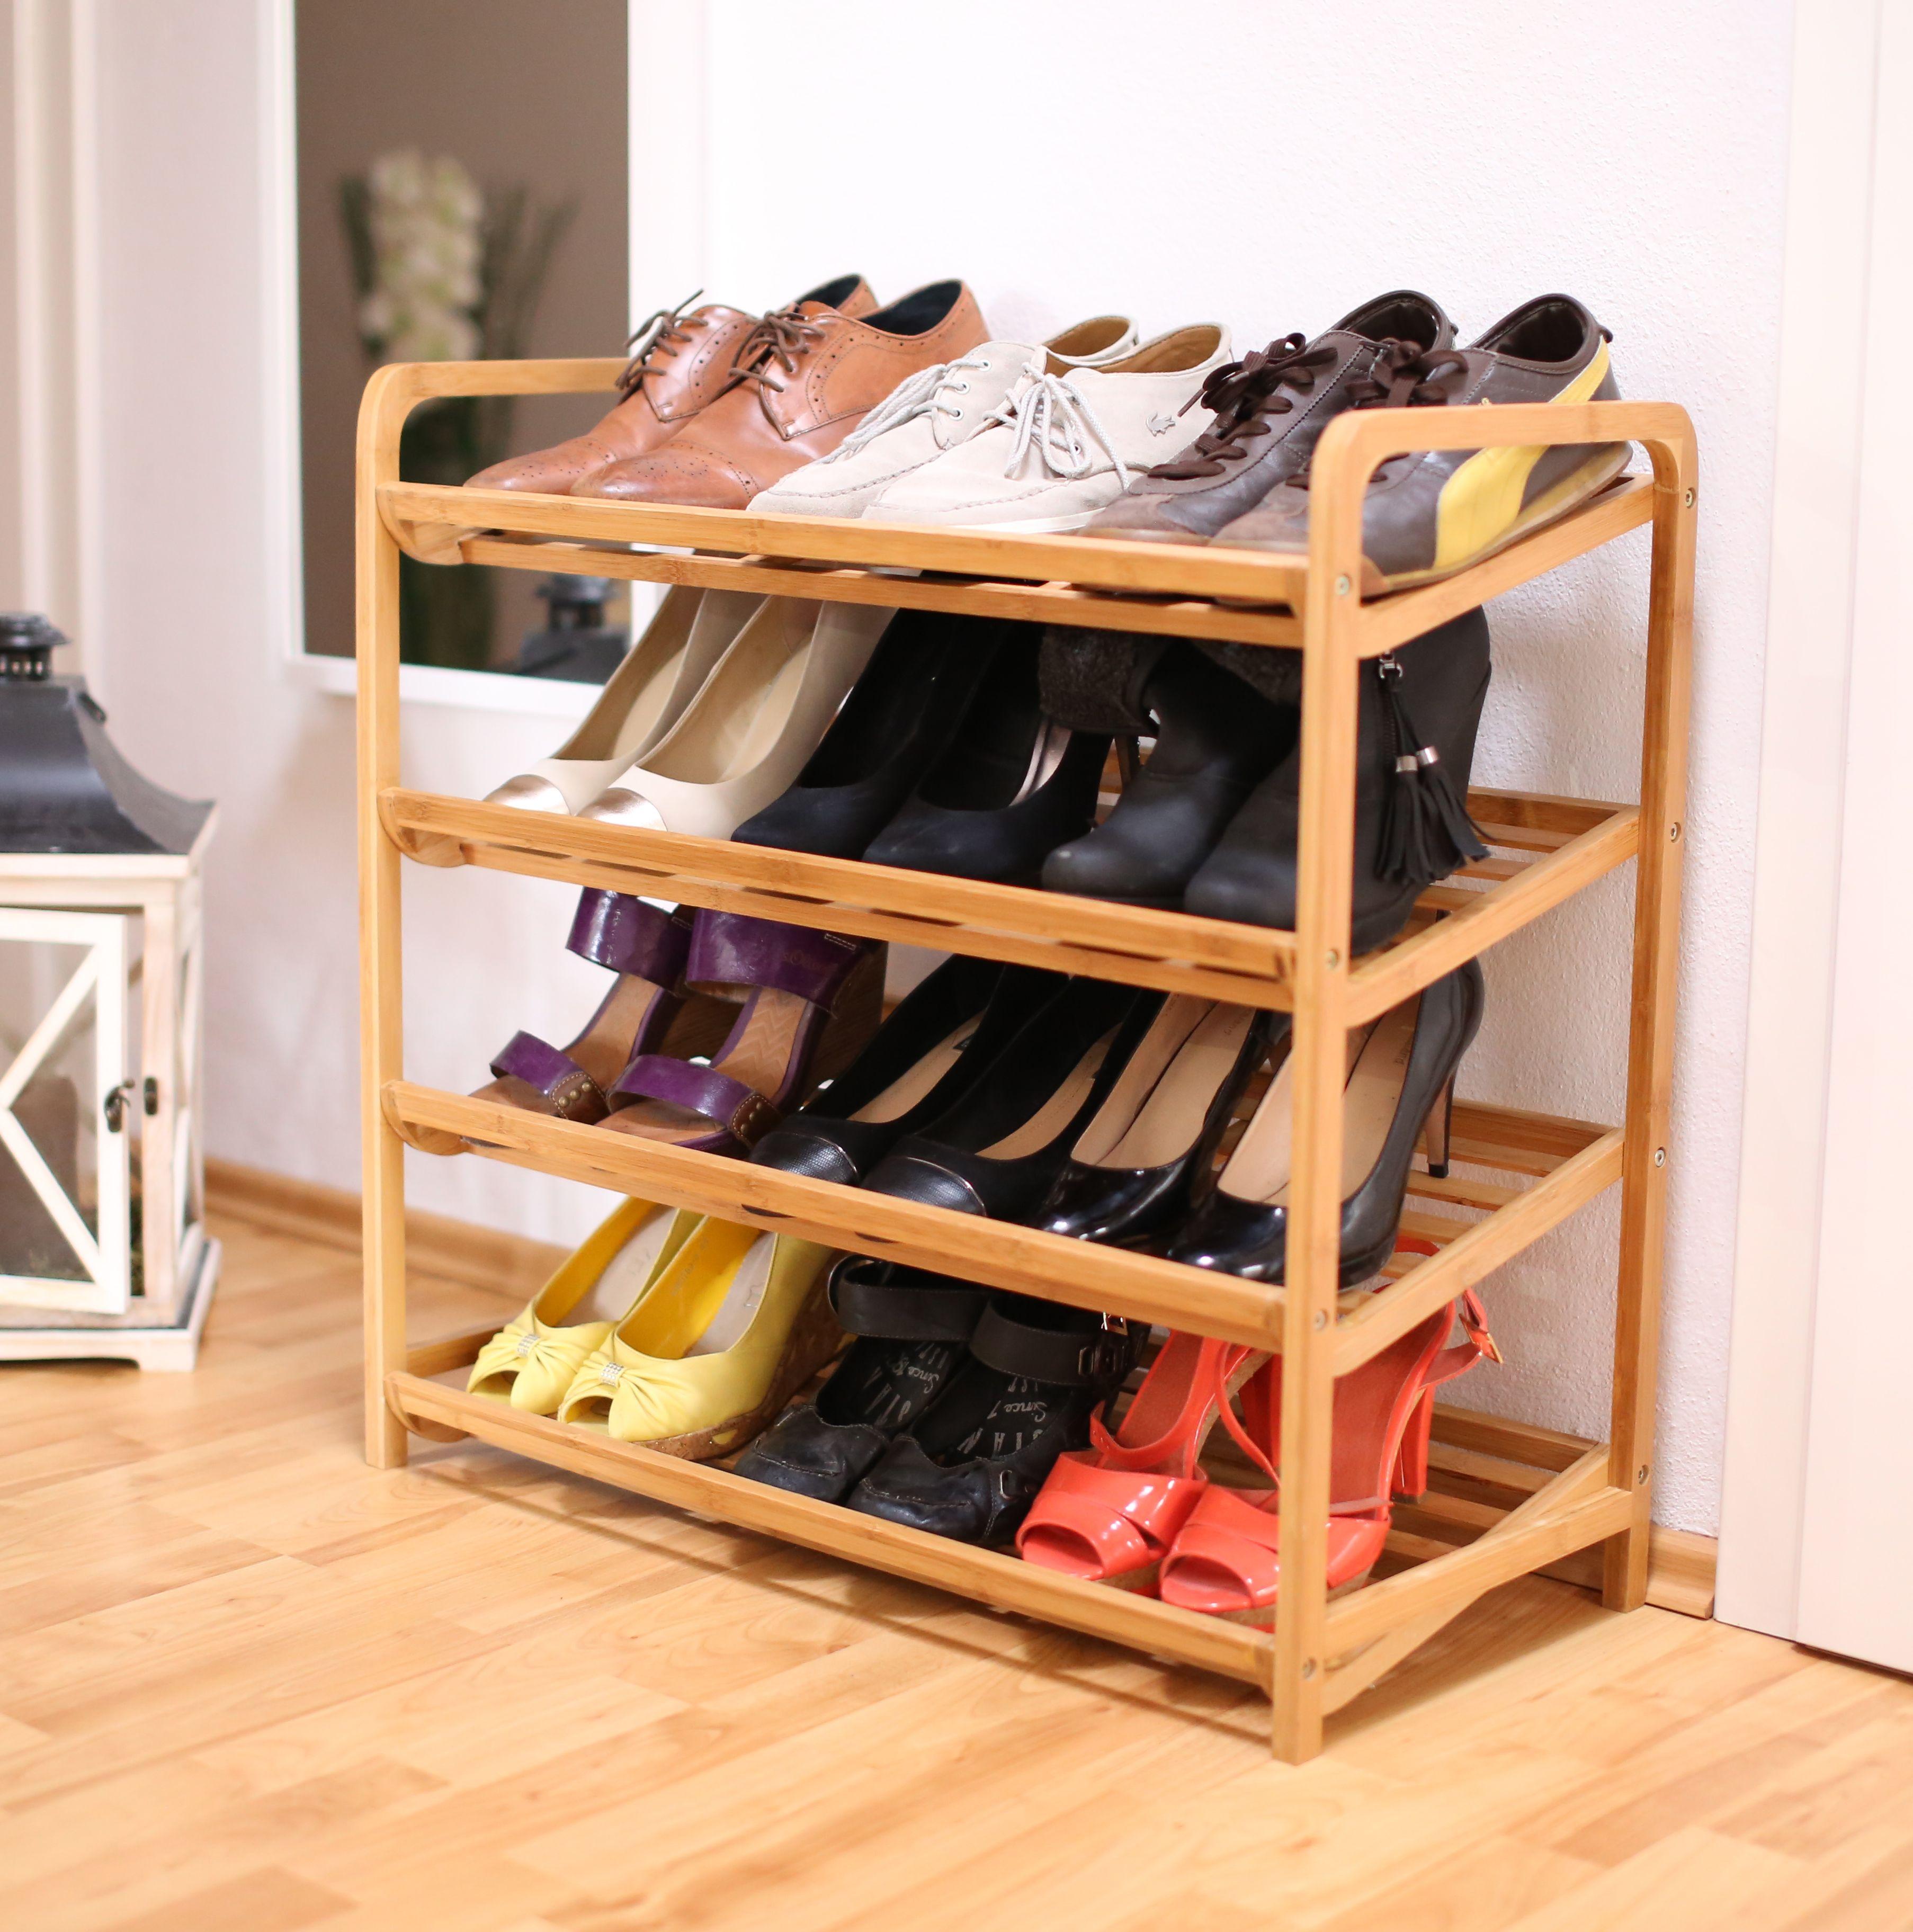 Holt Euch Das Robuste Schuhregal Aus Bambus Fur 12 Paar Schuhe